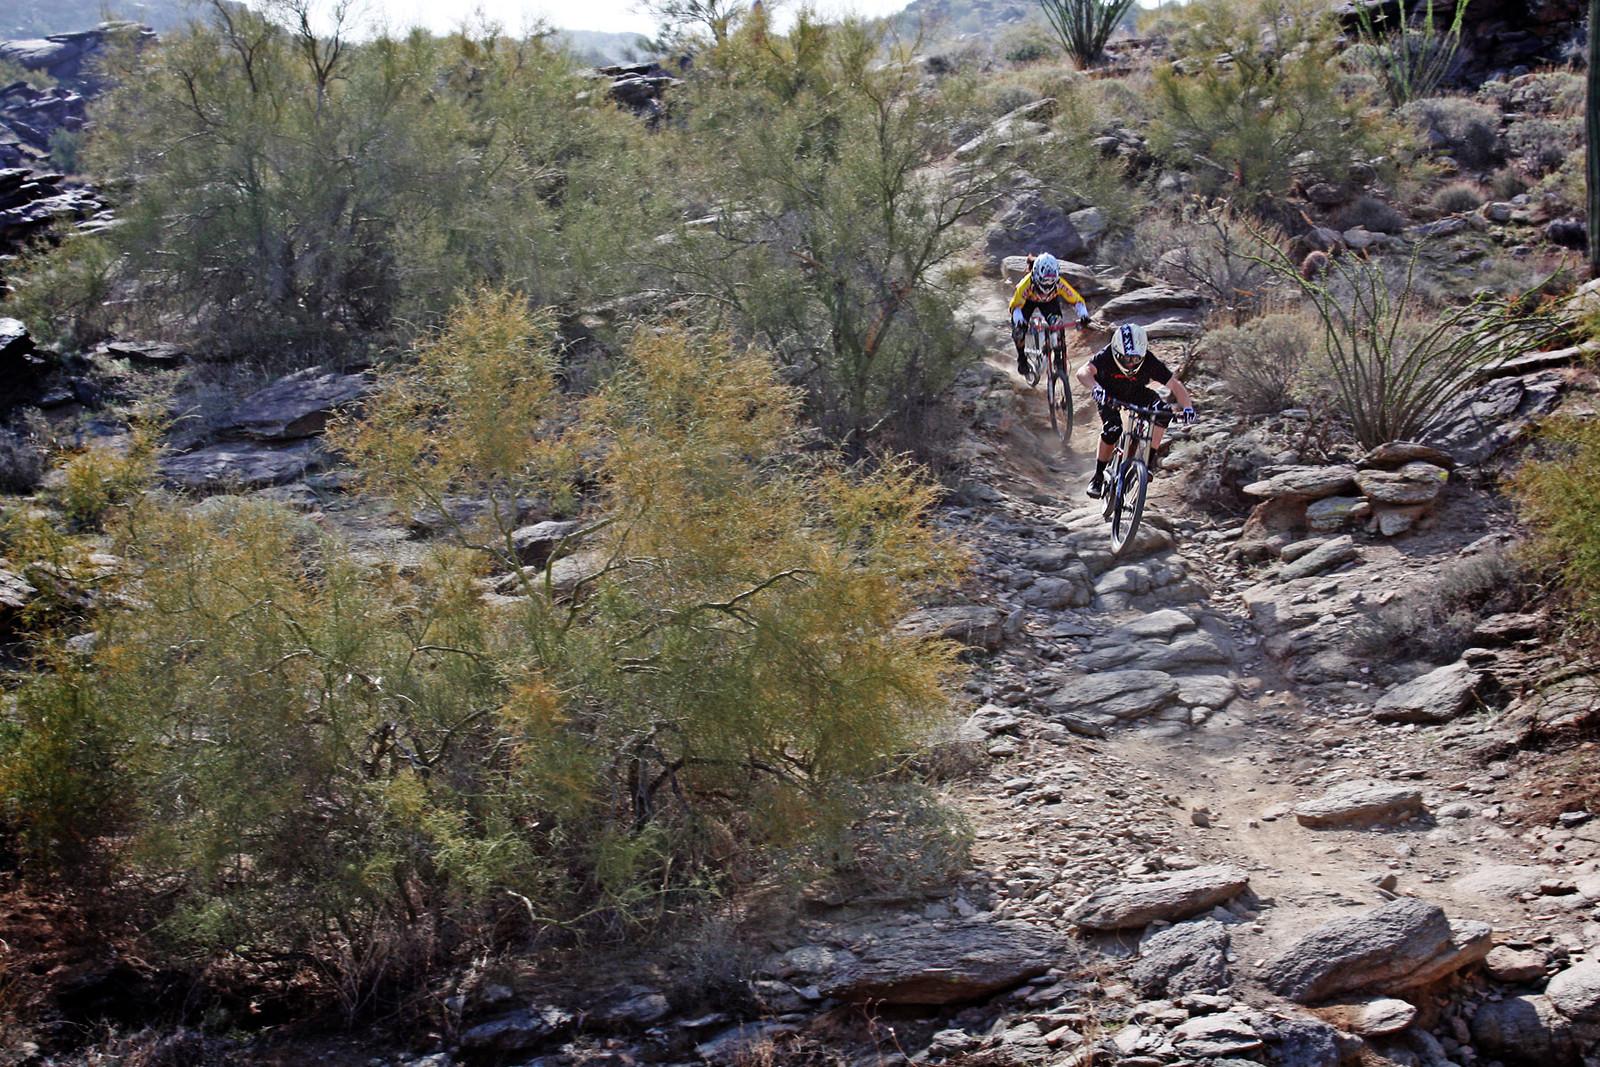 Aaron Gwin & Melissa Buhl 1 - azfreeride - Mountain Biking Pictures - Vital MTB